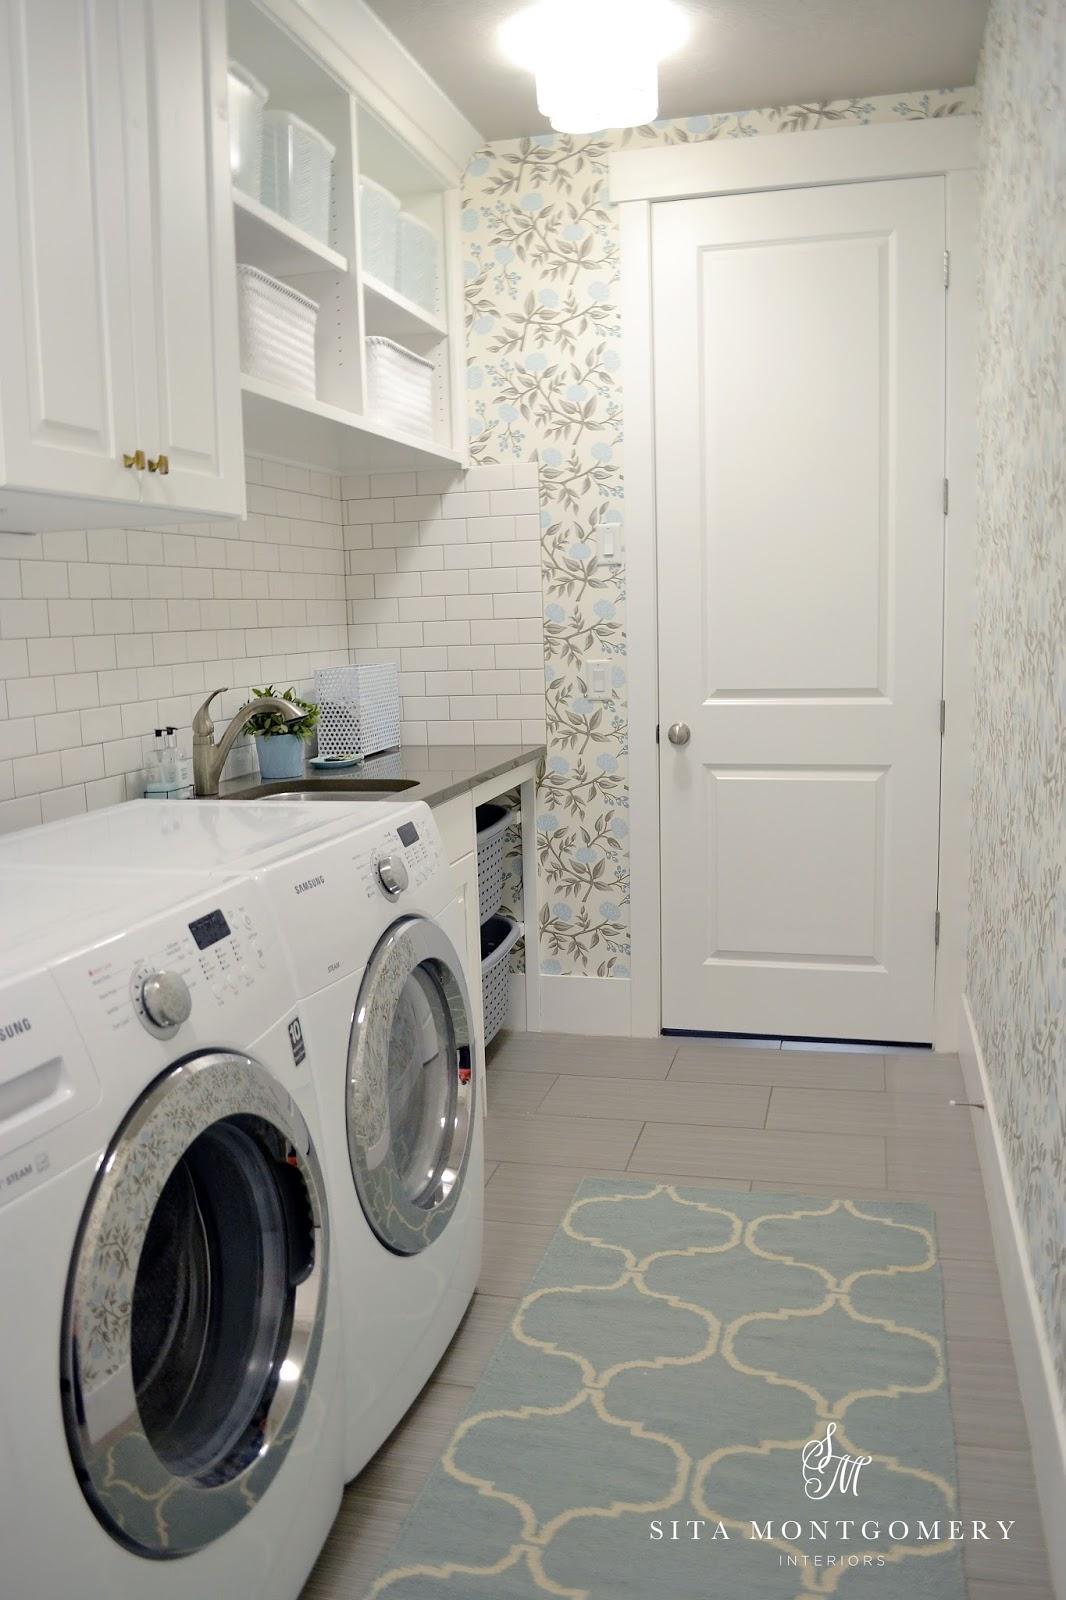 Sita Montgomery Interiors My Home Laundry Room Makeover Reveal